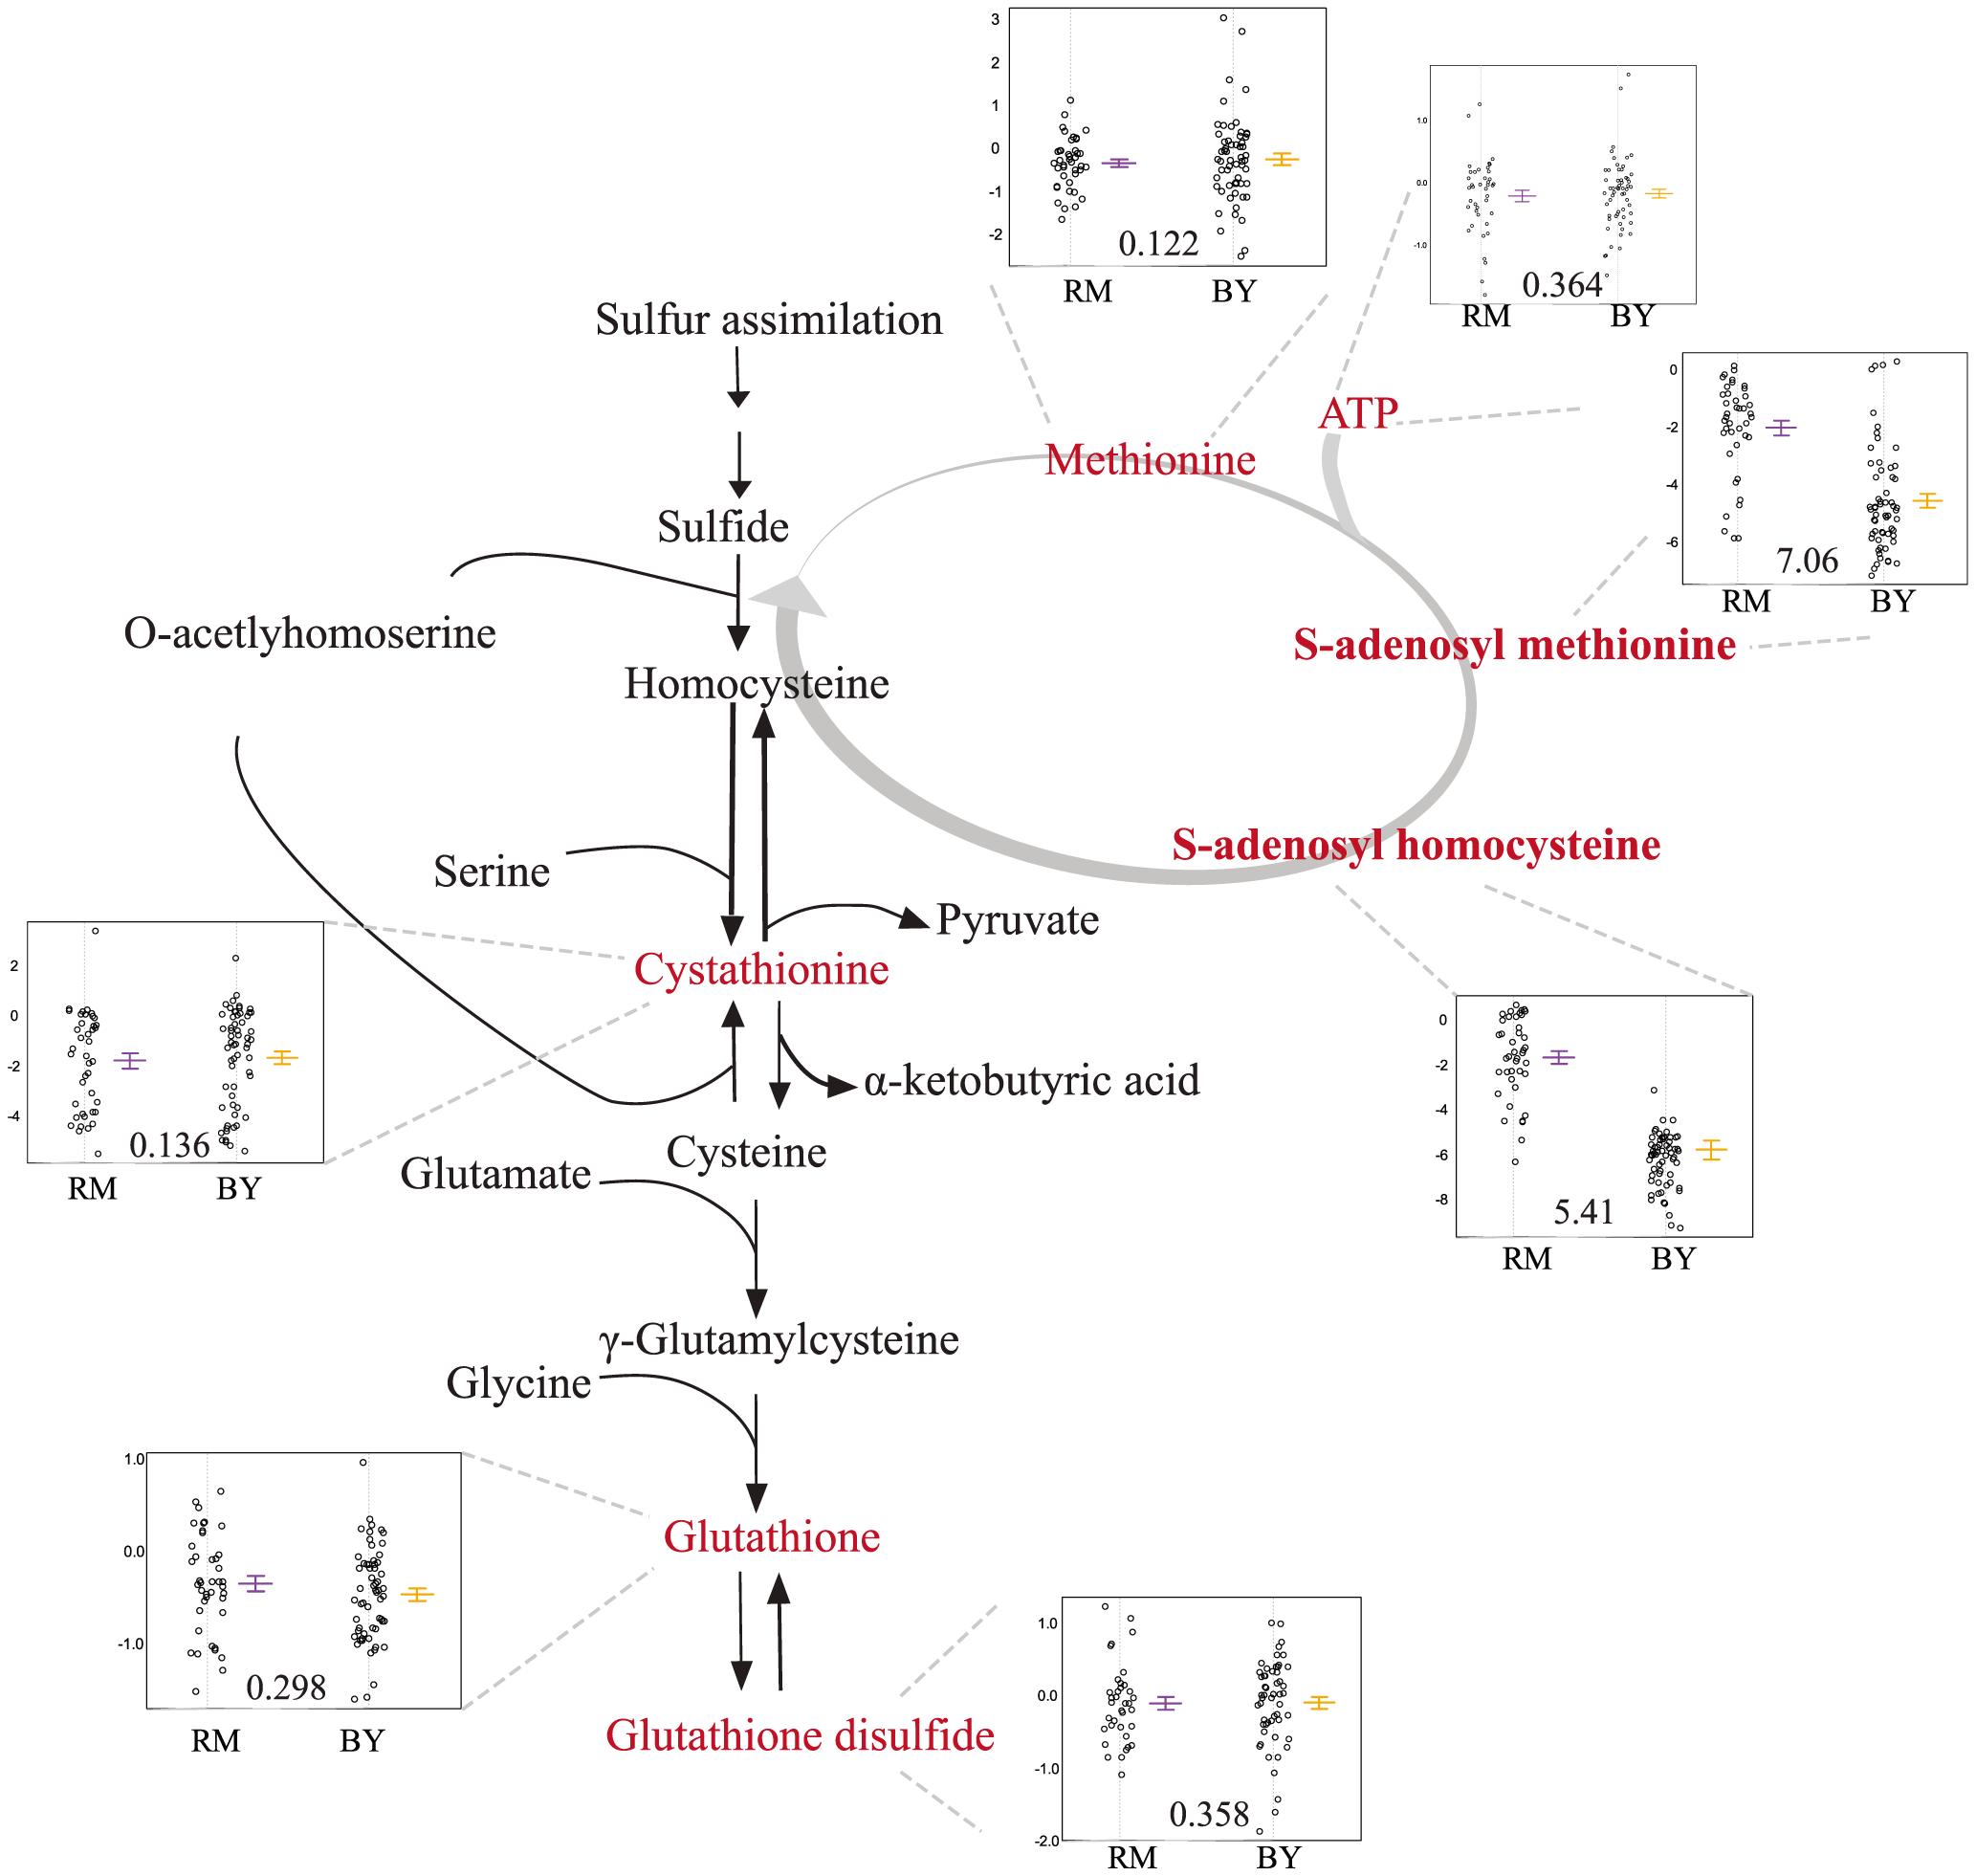 Levels of sulfur-assimilation intermediates differ based on the <i>slt2</i> allele inherited.